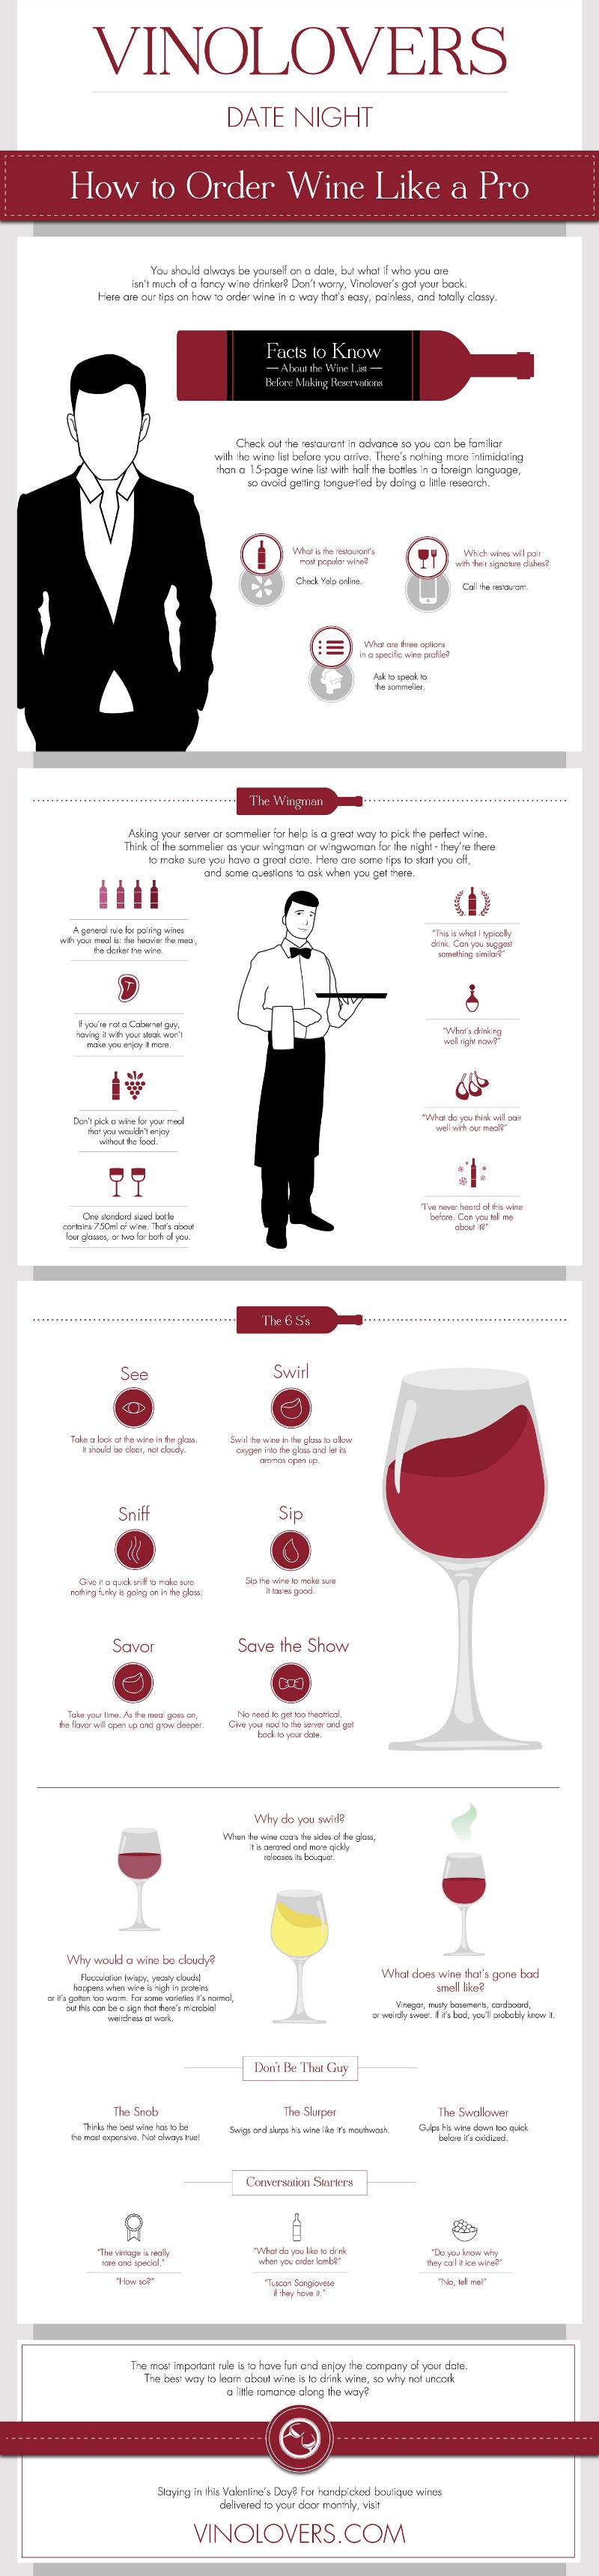 Taste-Wine-Like-an-Expert